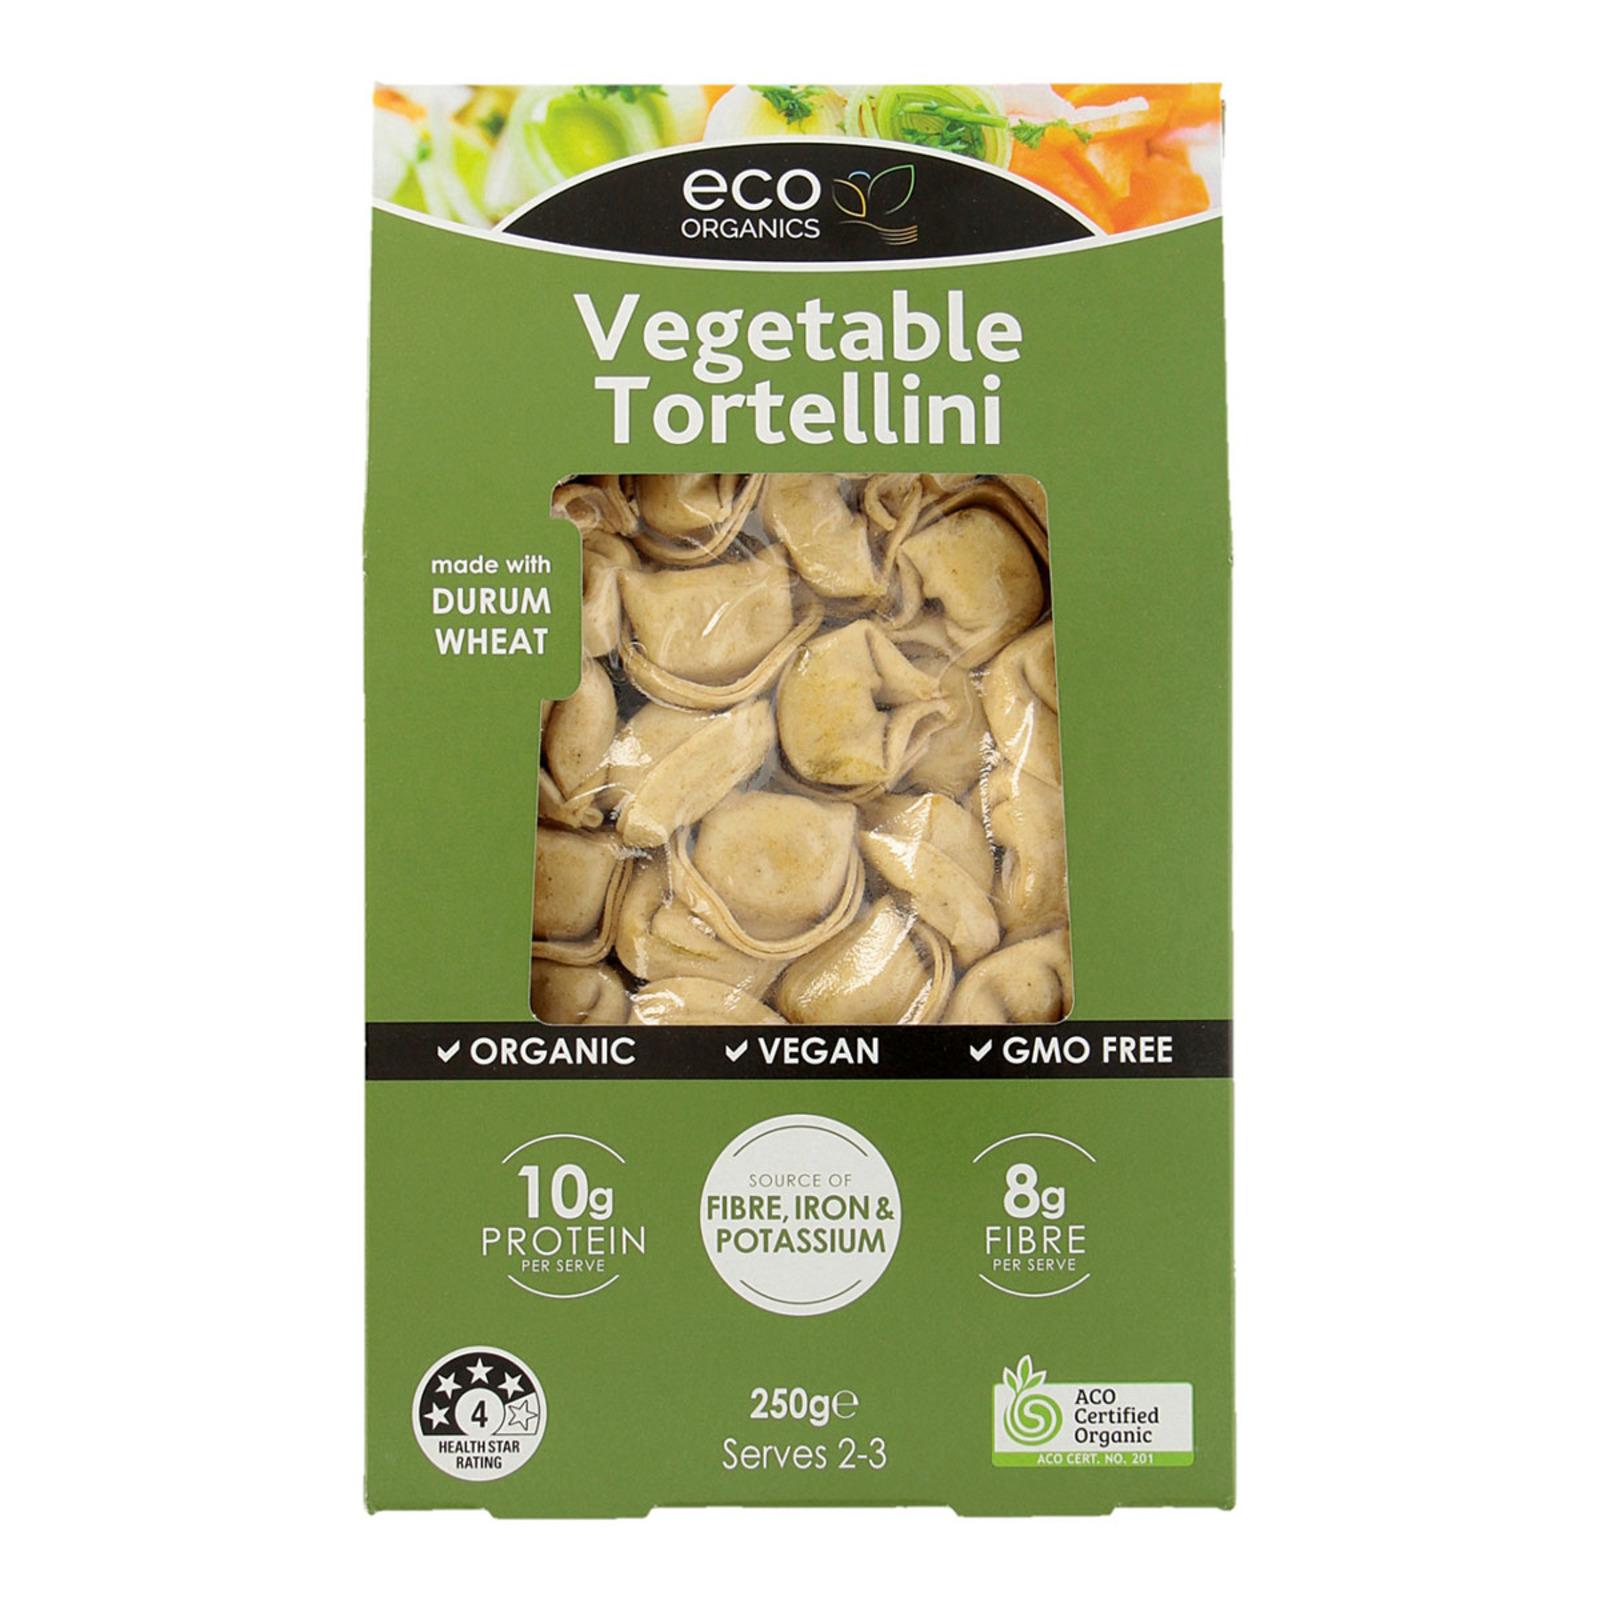 Eco Organics Pasta Vegetable Tortellini